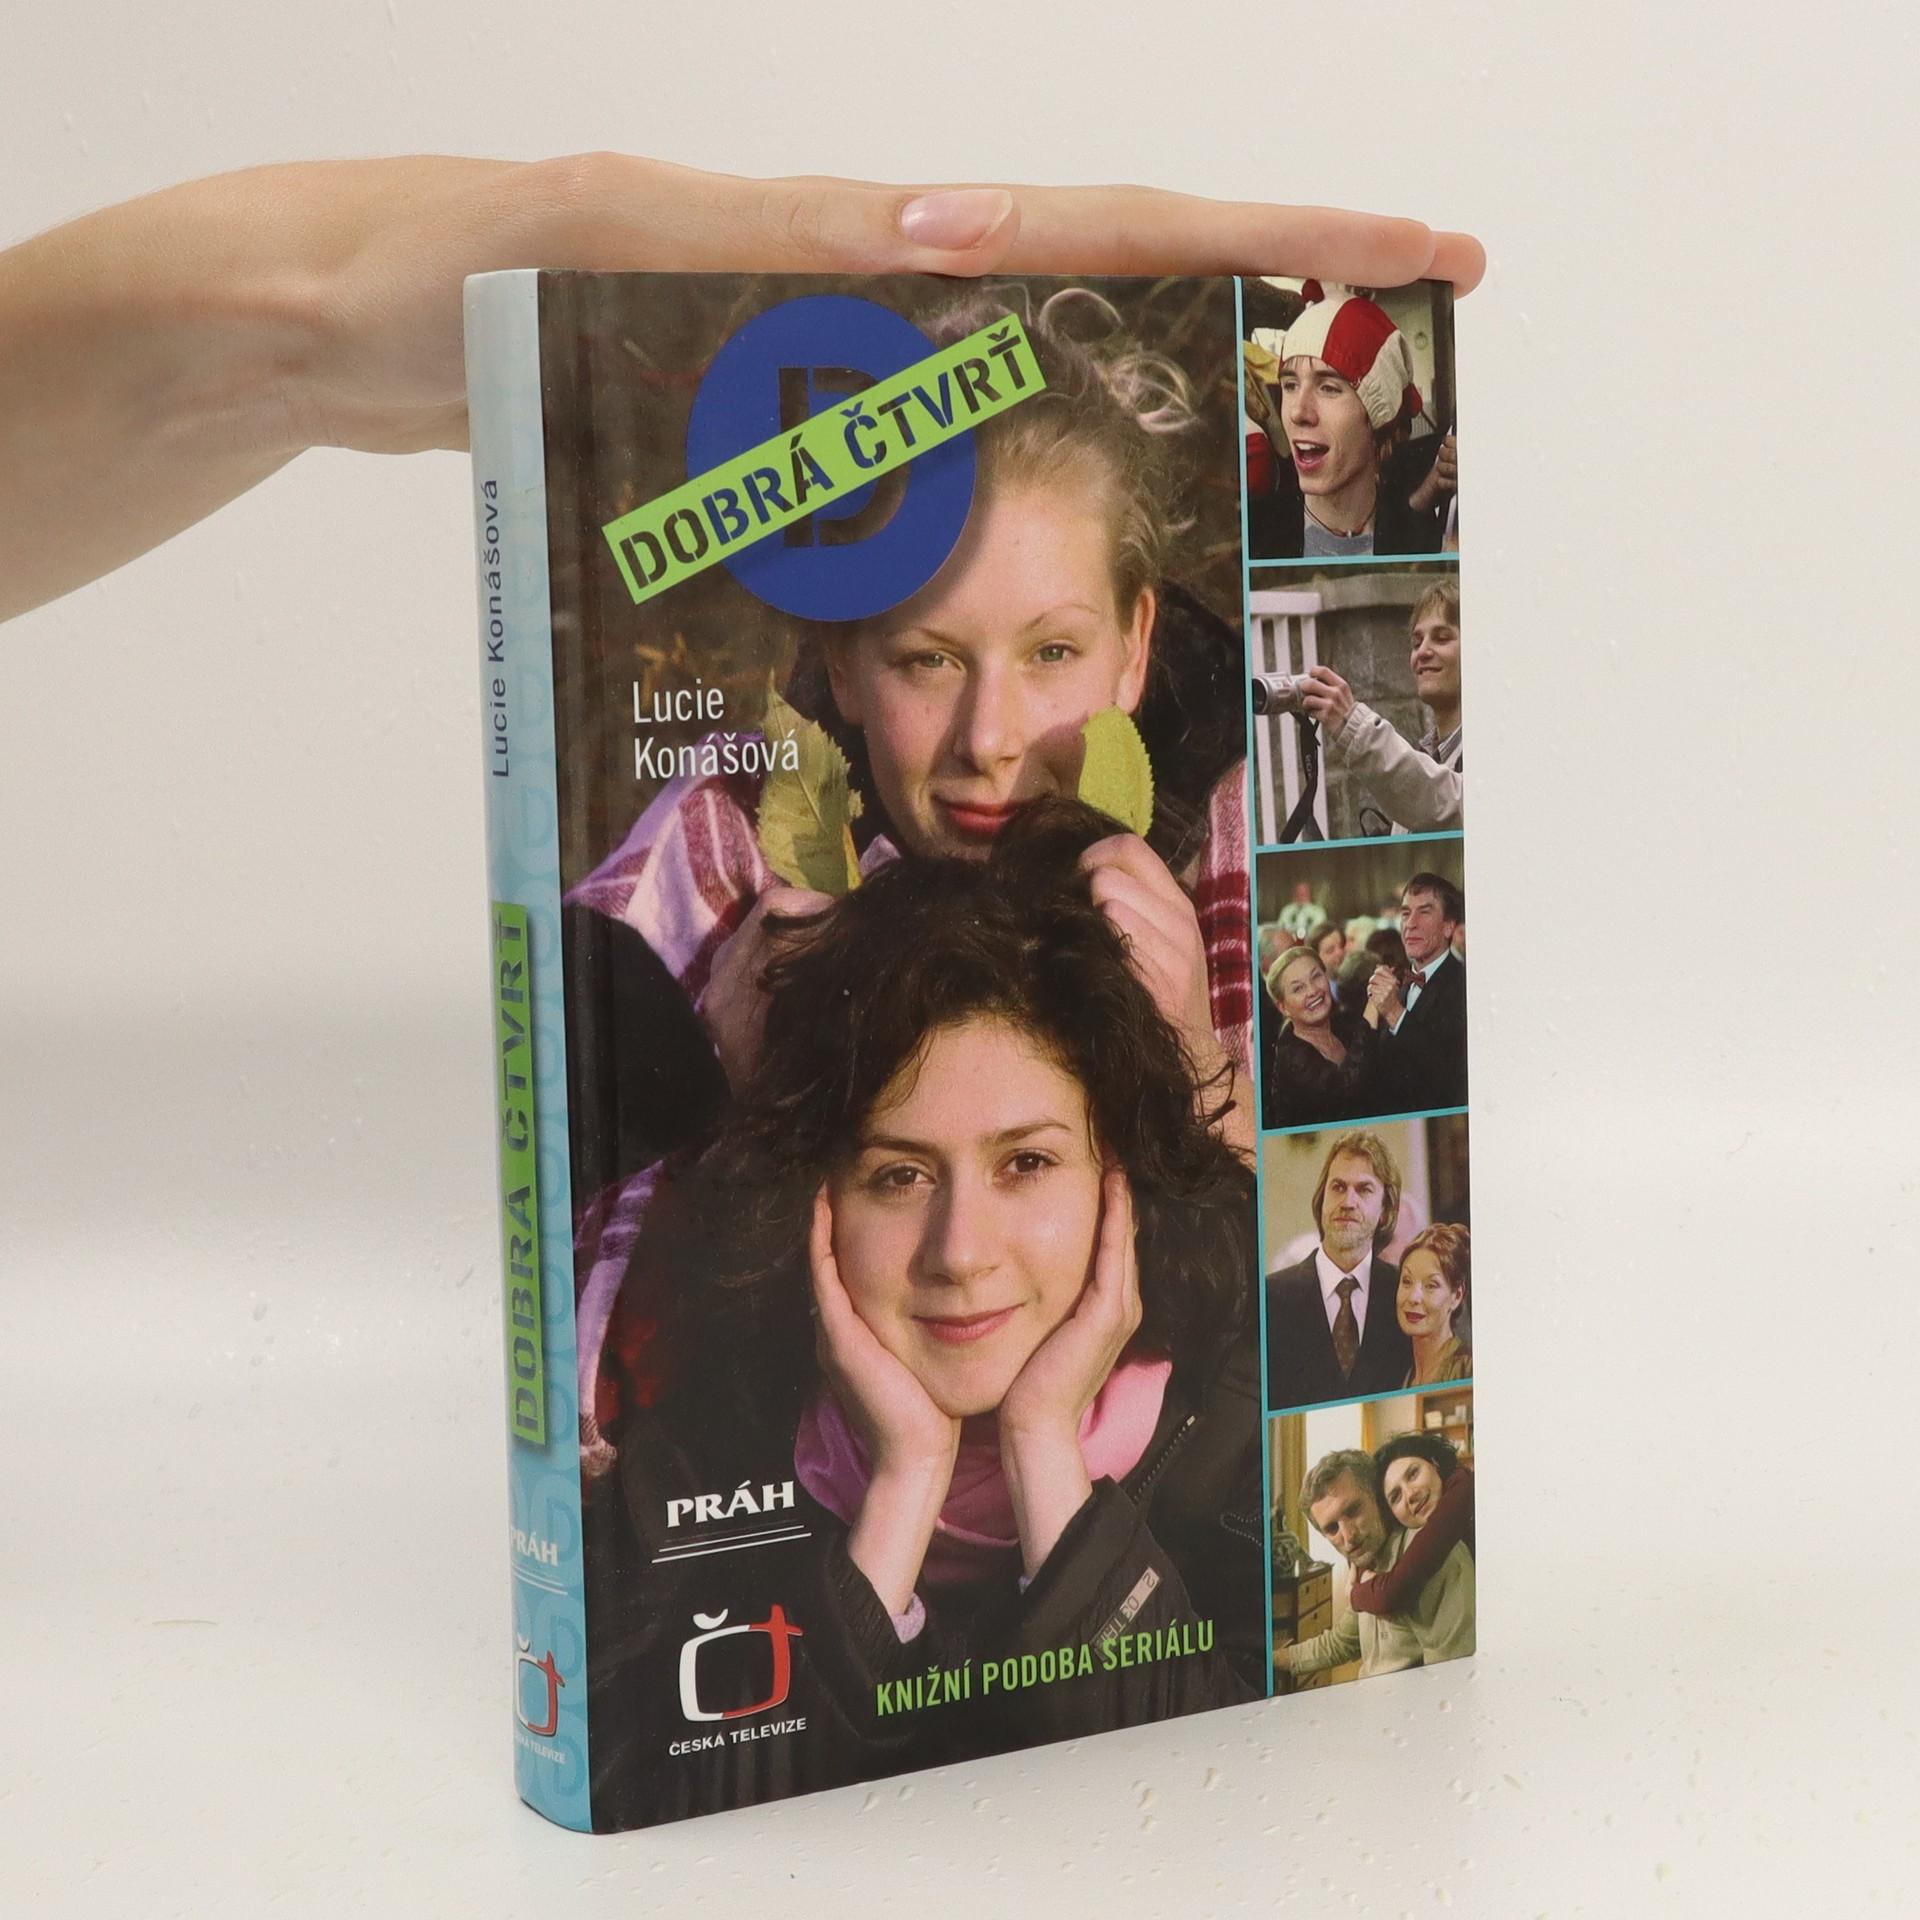 antikvární kniha Dobrá čtvrť, 2005